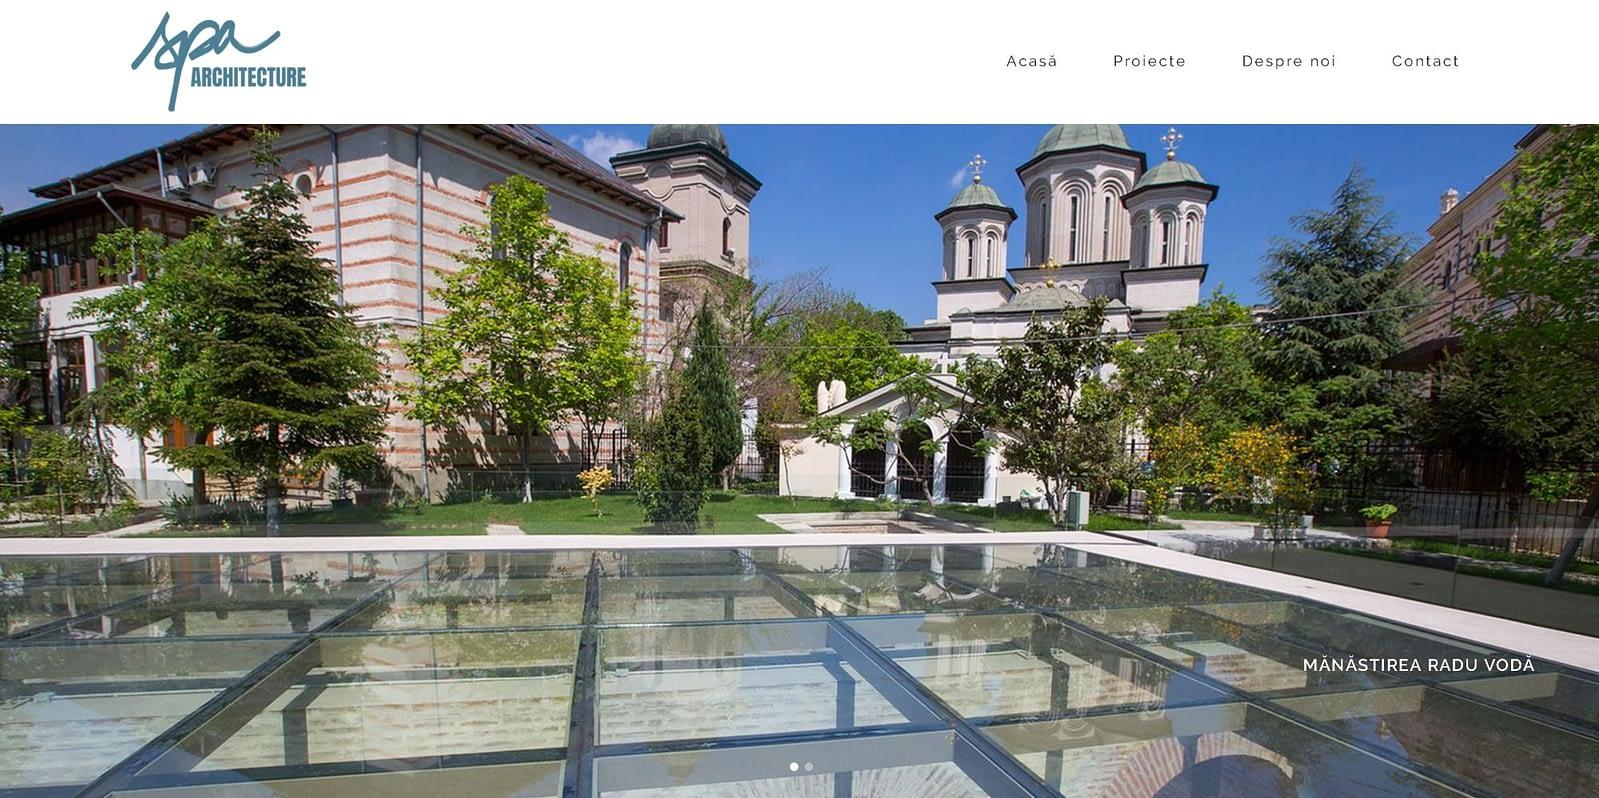 creare site prezentare, website, web design, web, design, Toud, realizare site web, SPA Architecture